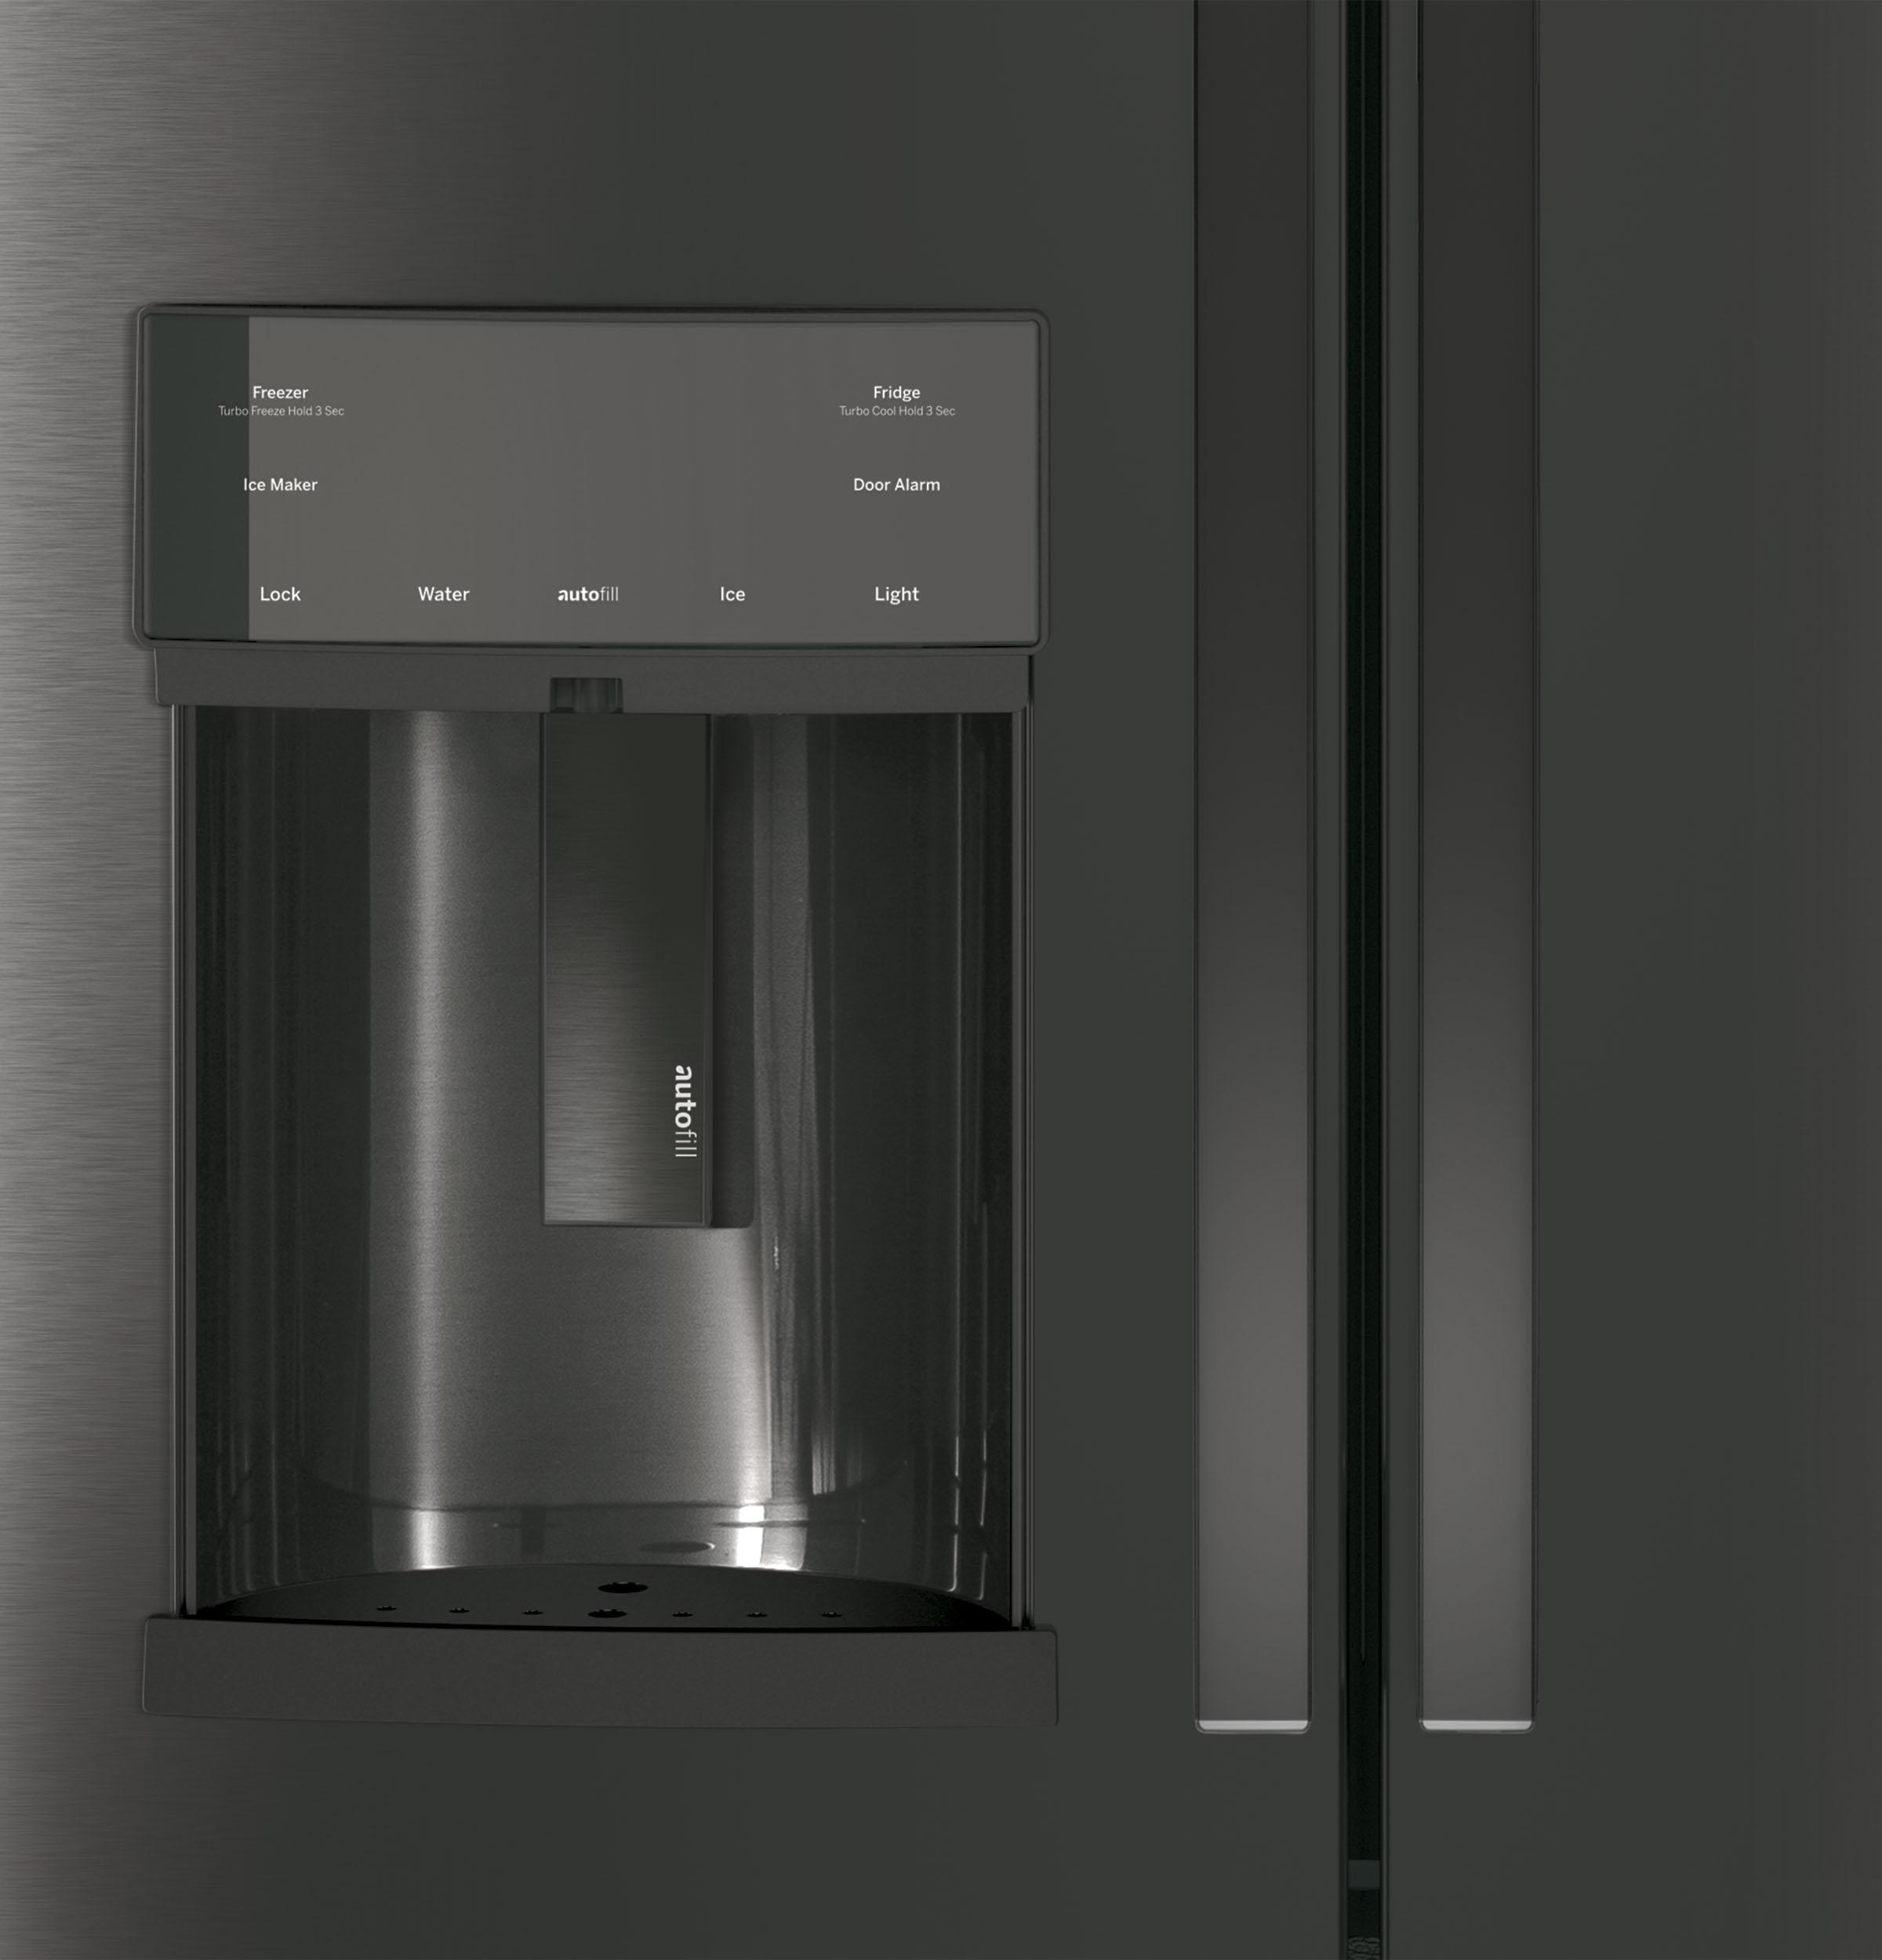 Model: PYD22KBLTS | GE Profile GE Profile™ Series 22.1 Cu. Ft. Counter-Depth French-Door Refrigerator with Door In Door and Hands-Free AutoFill